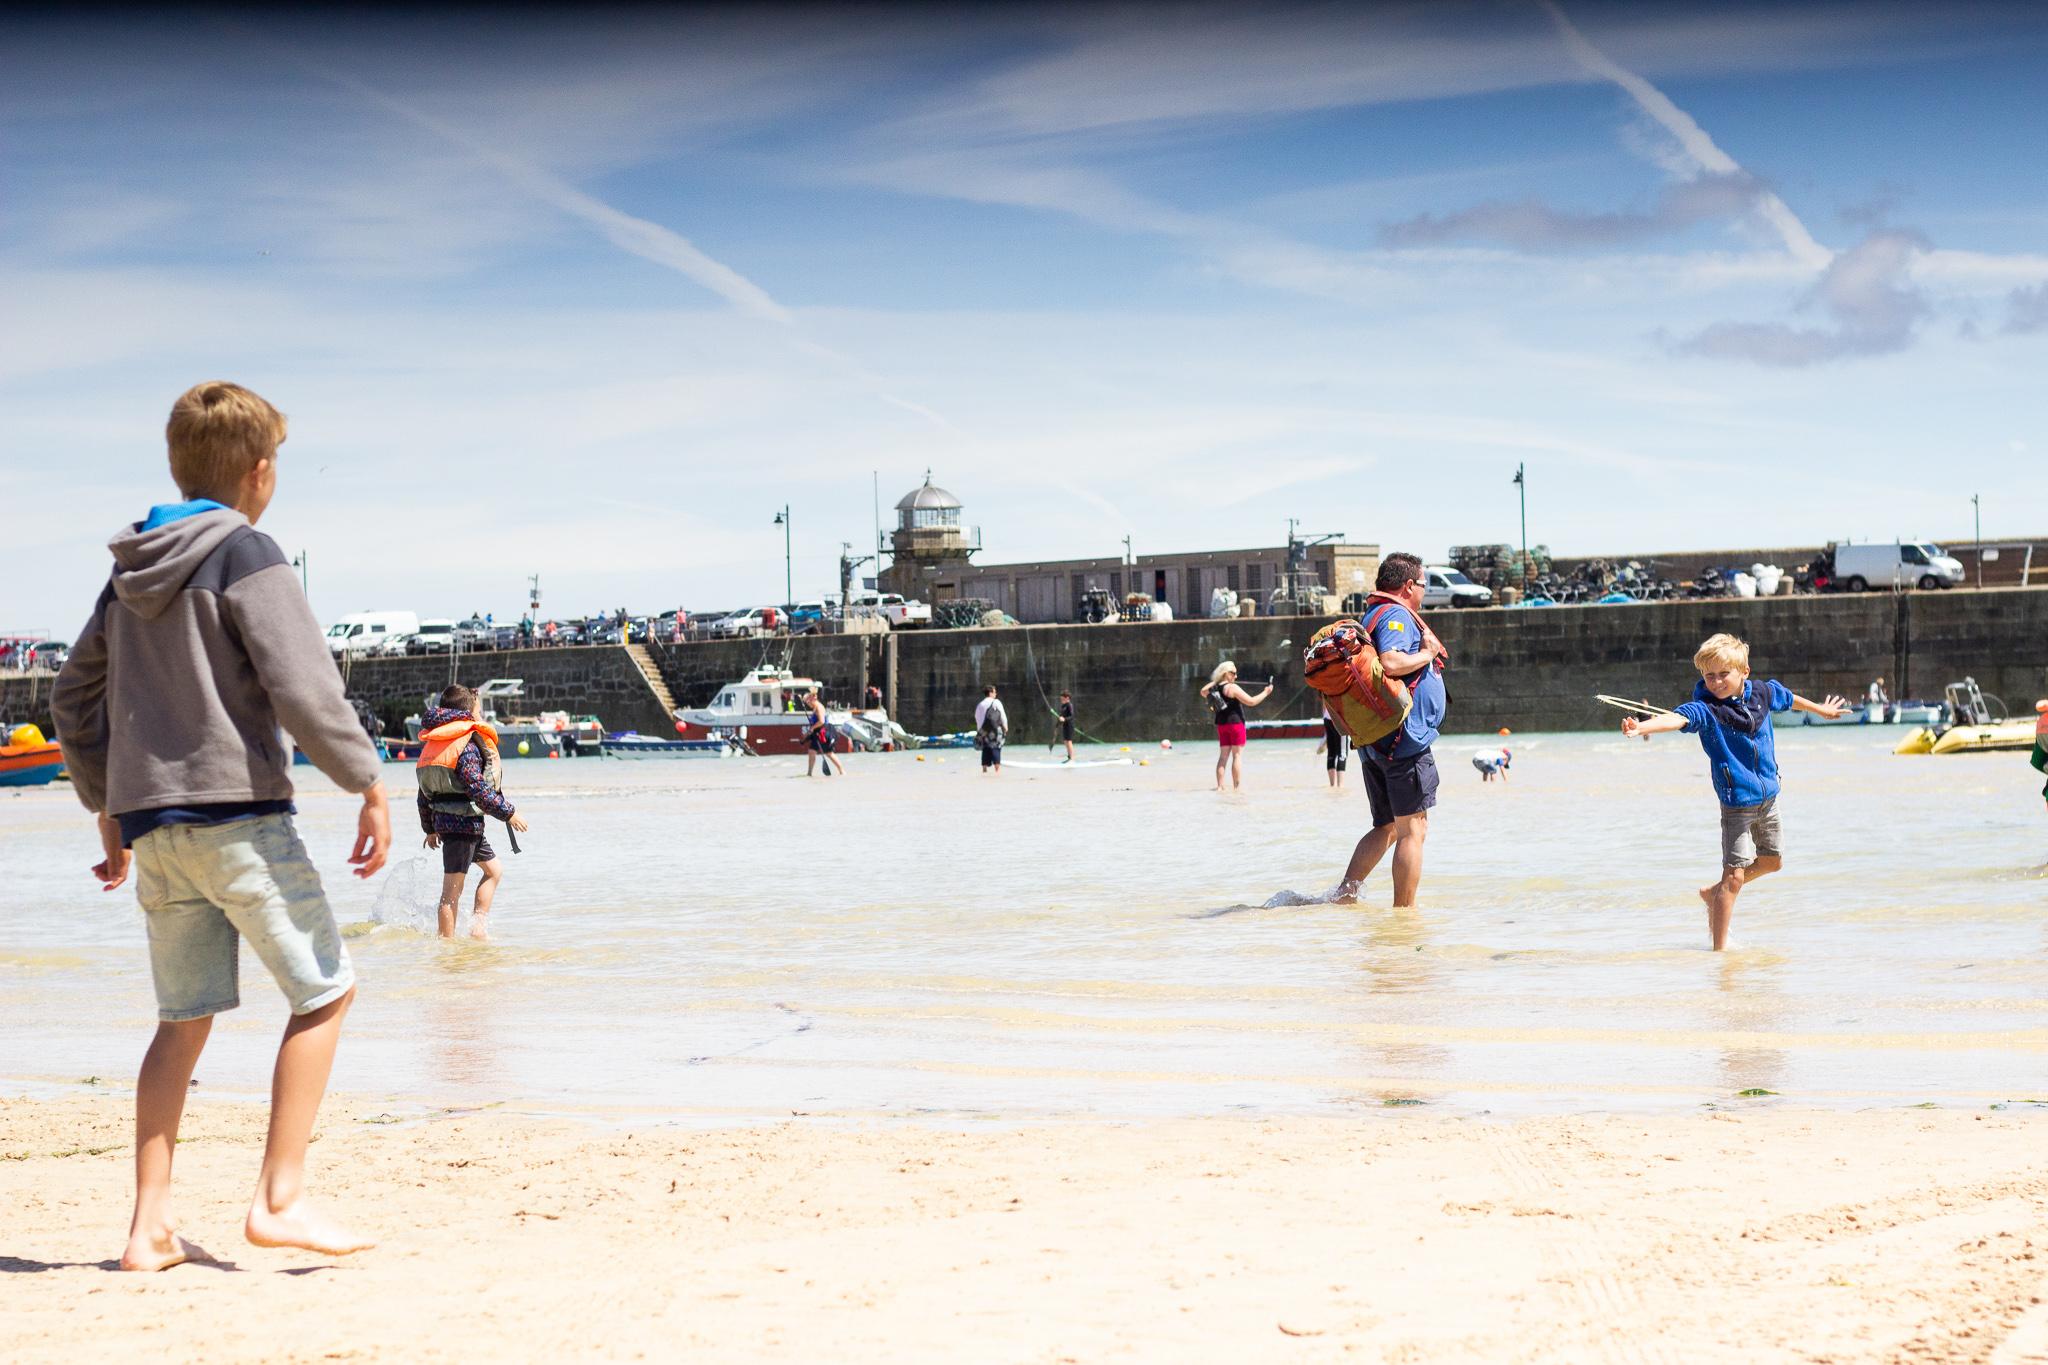 Frisbee on the beach……  #sunshinenotscreentime